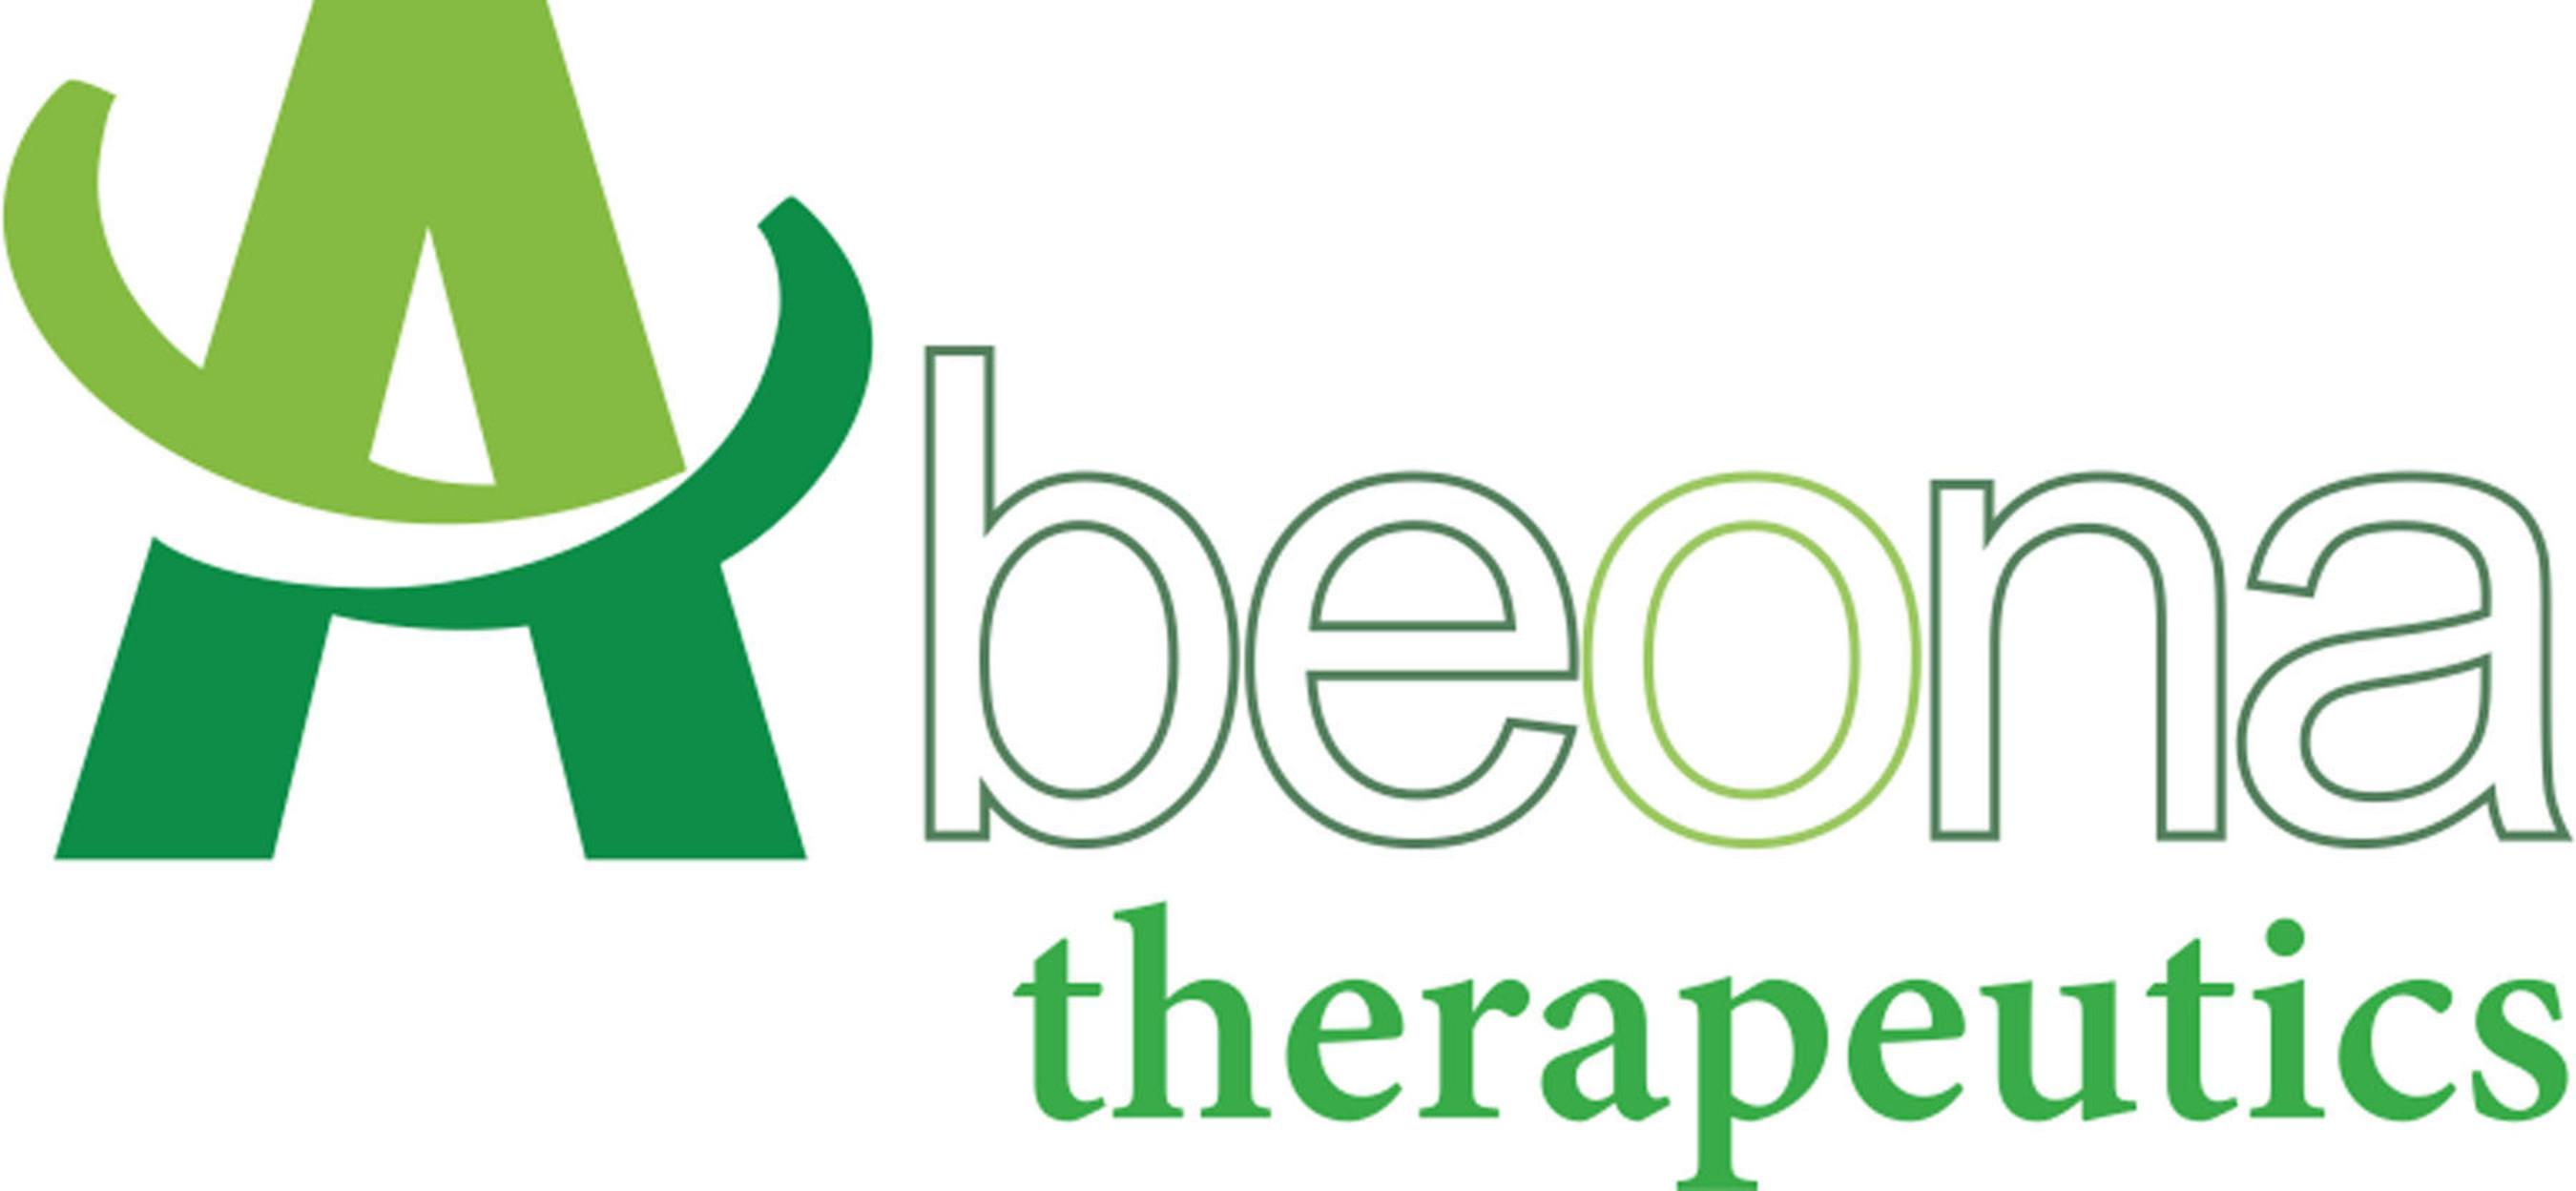 Abeona Therapeutics Logo.